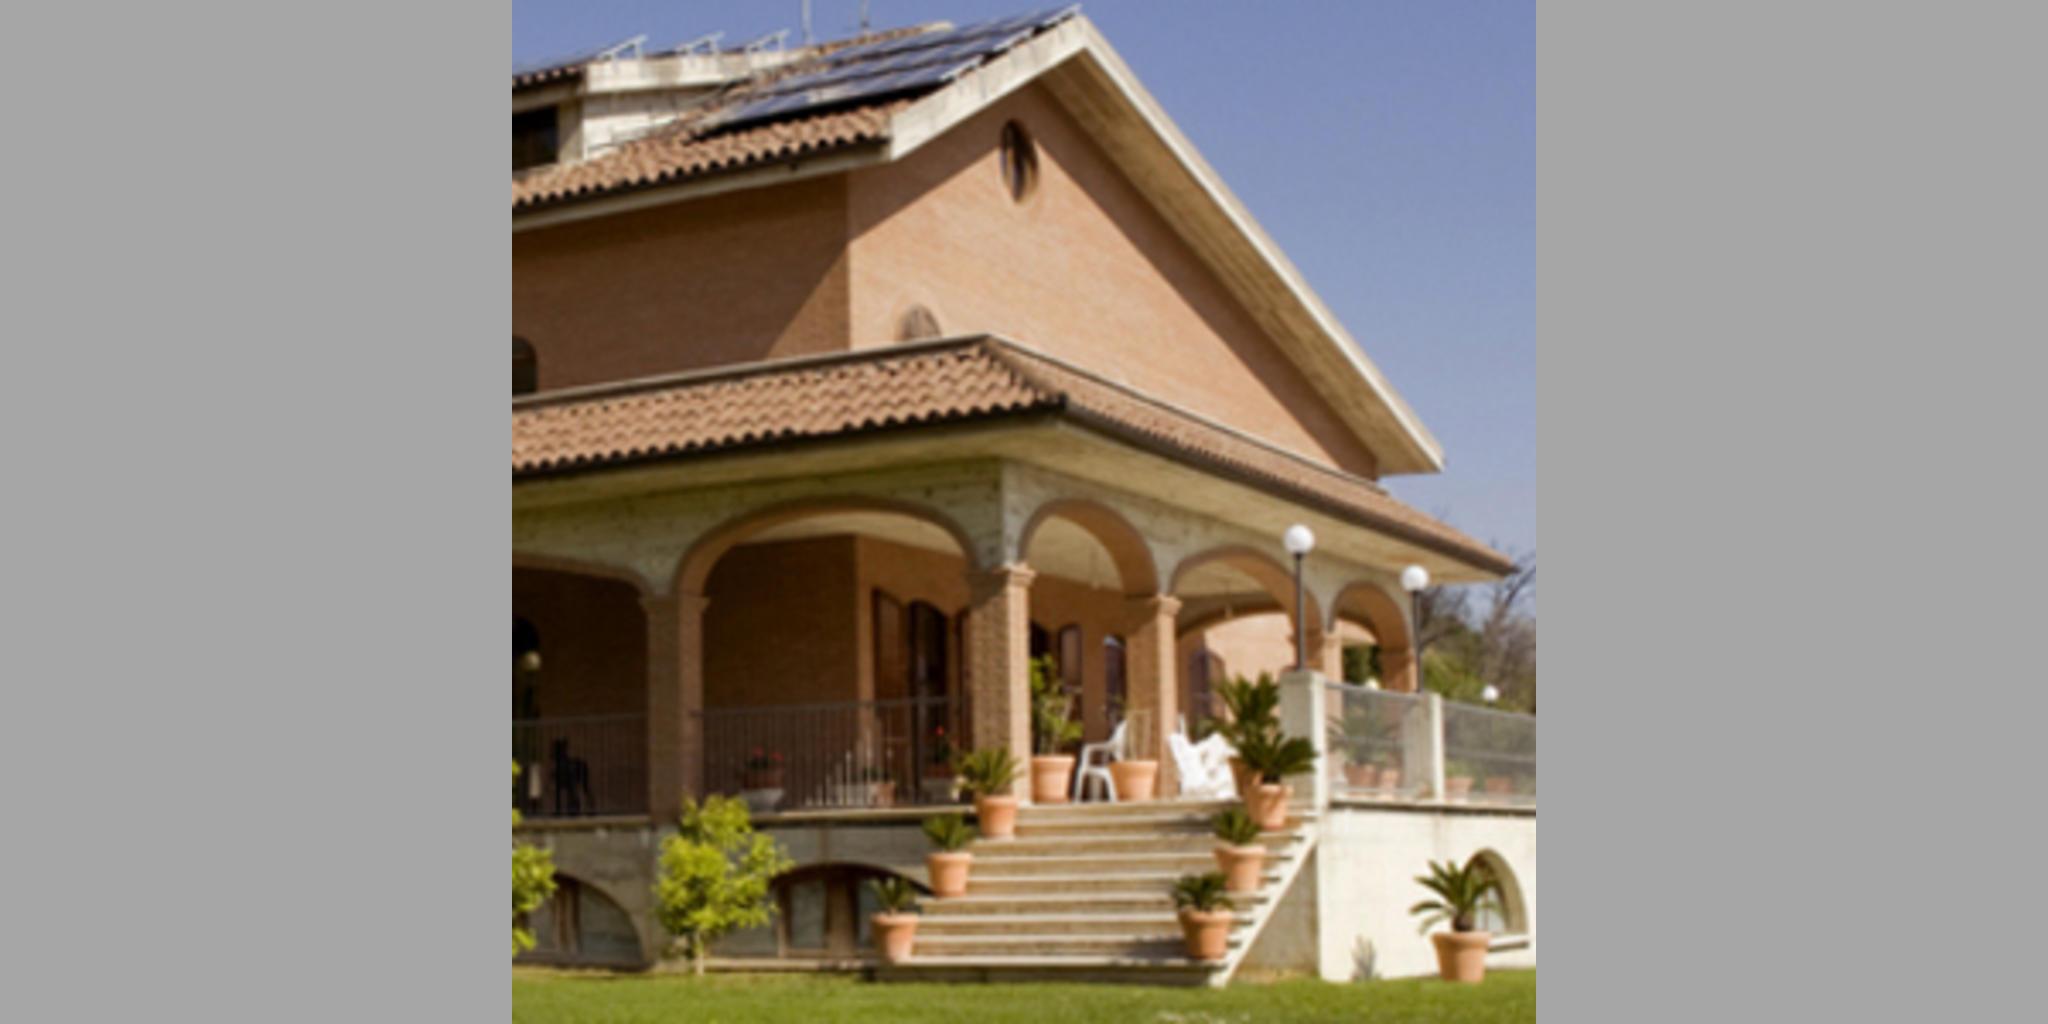 Bed & Breakfast Ascoli Piceno - Ascoli  Via Umberto Giordano